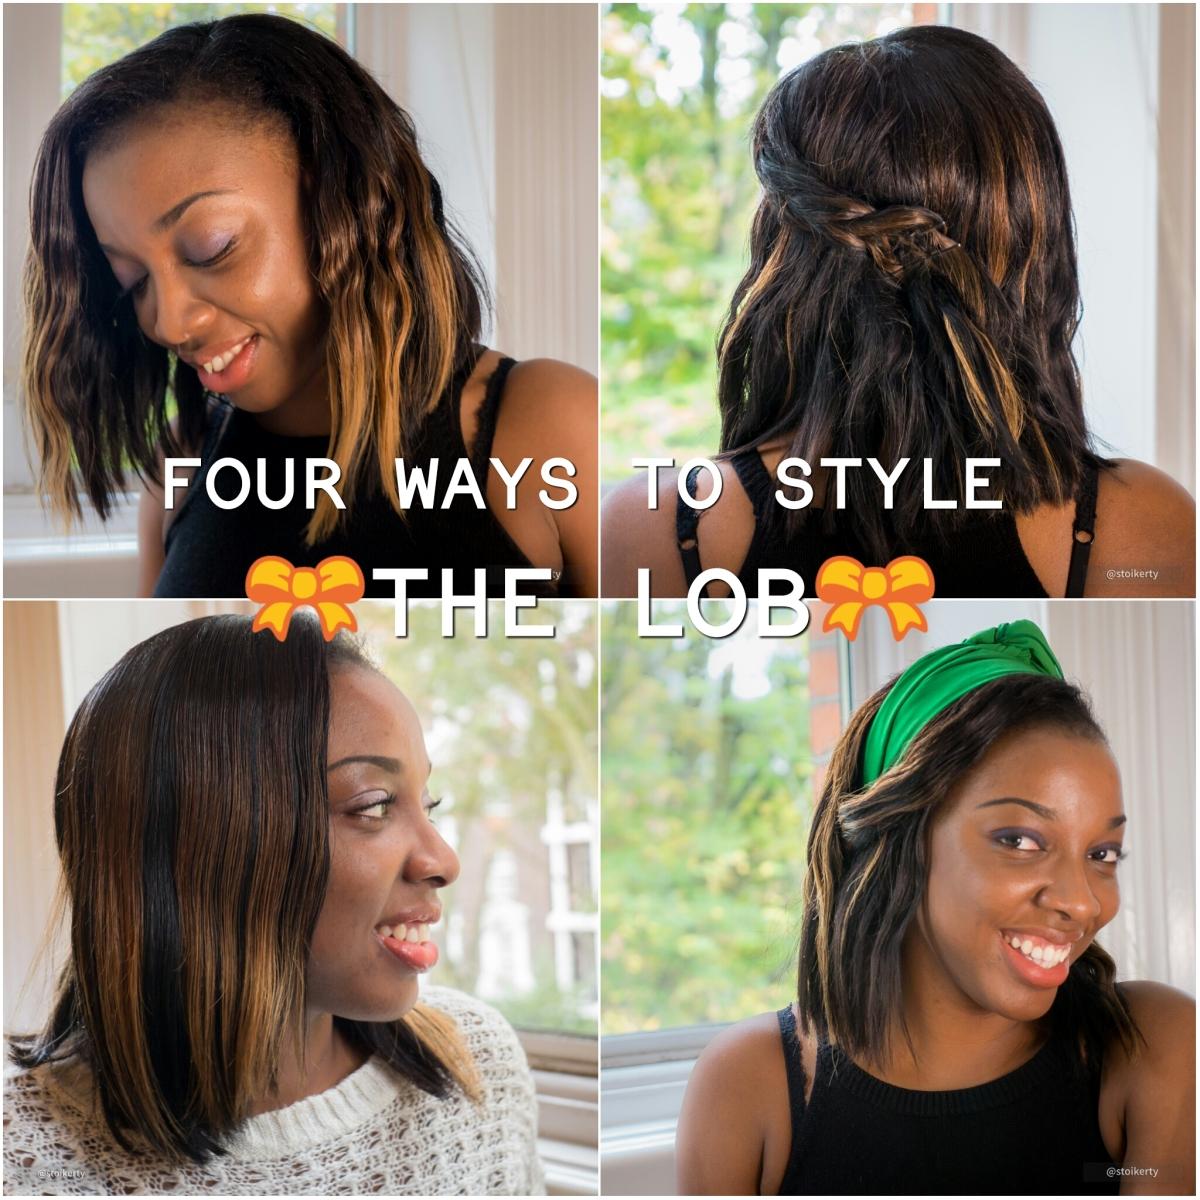 4 Ways to Style the LOB(Long Bob)